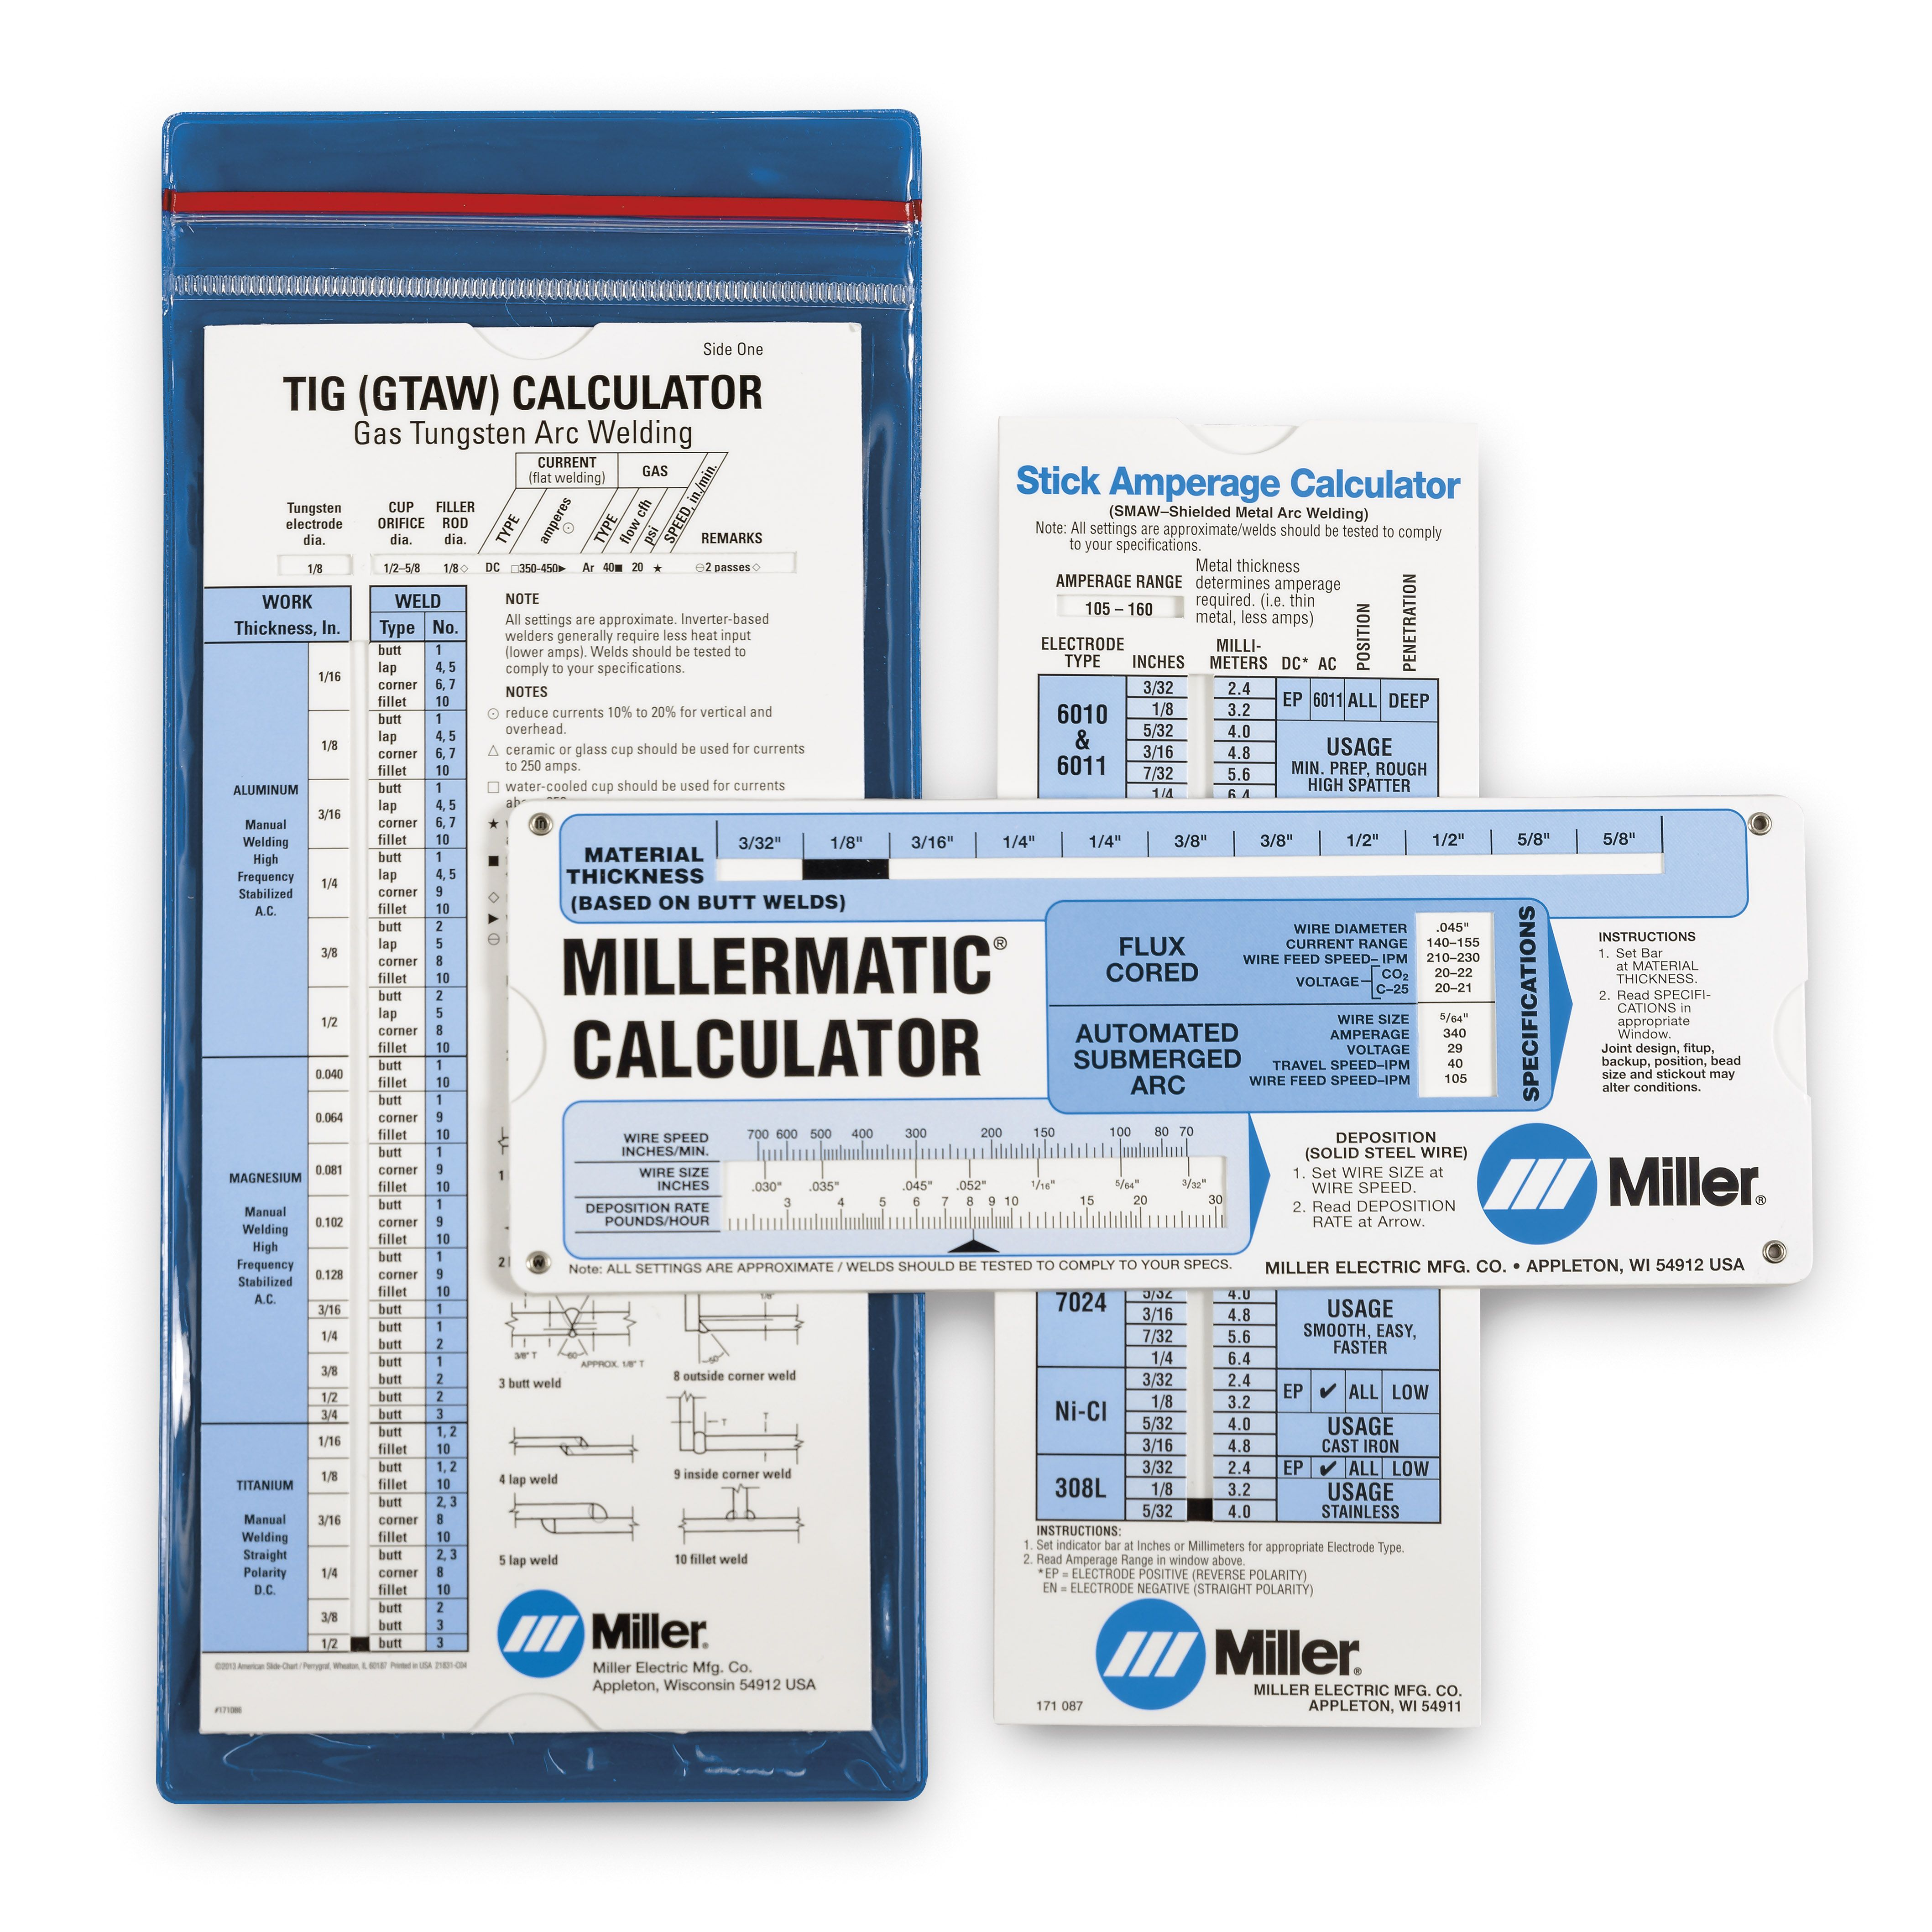 043125 3 Pack Mig Tig Stick Calculators Jpg 4 234 4 234 Pixels Gas Tungsten Arc Welding Welding Arc Welding